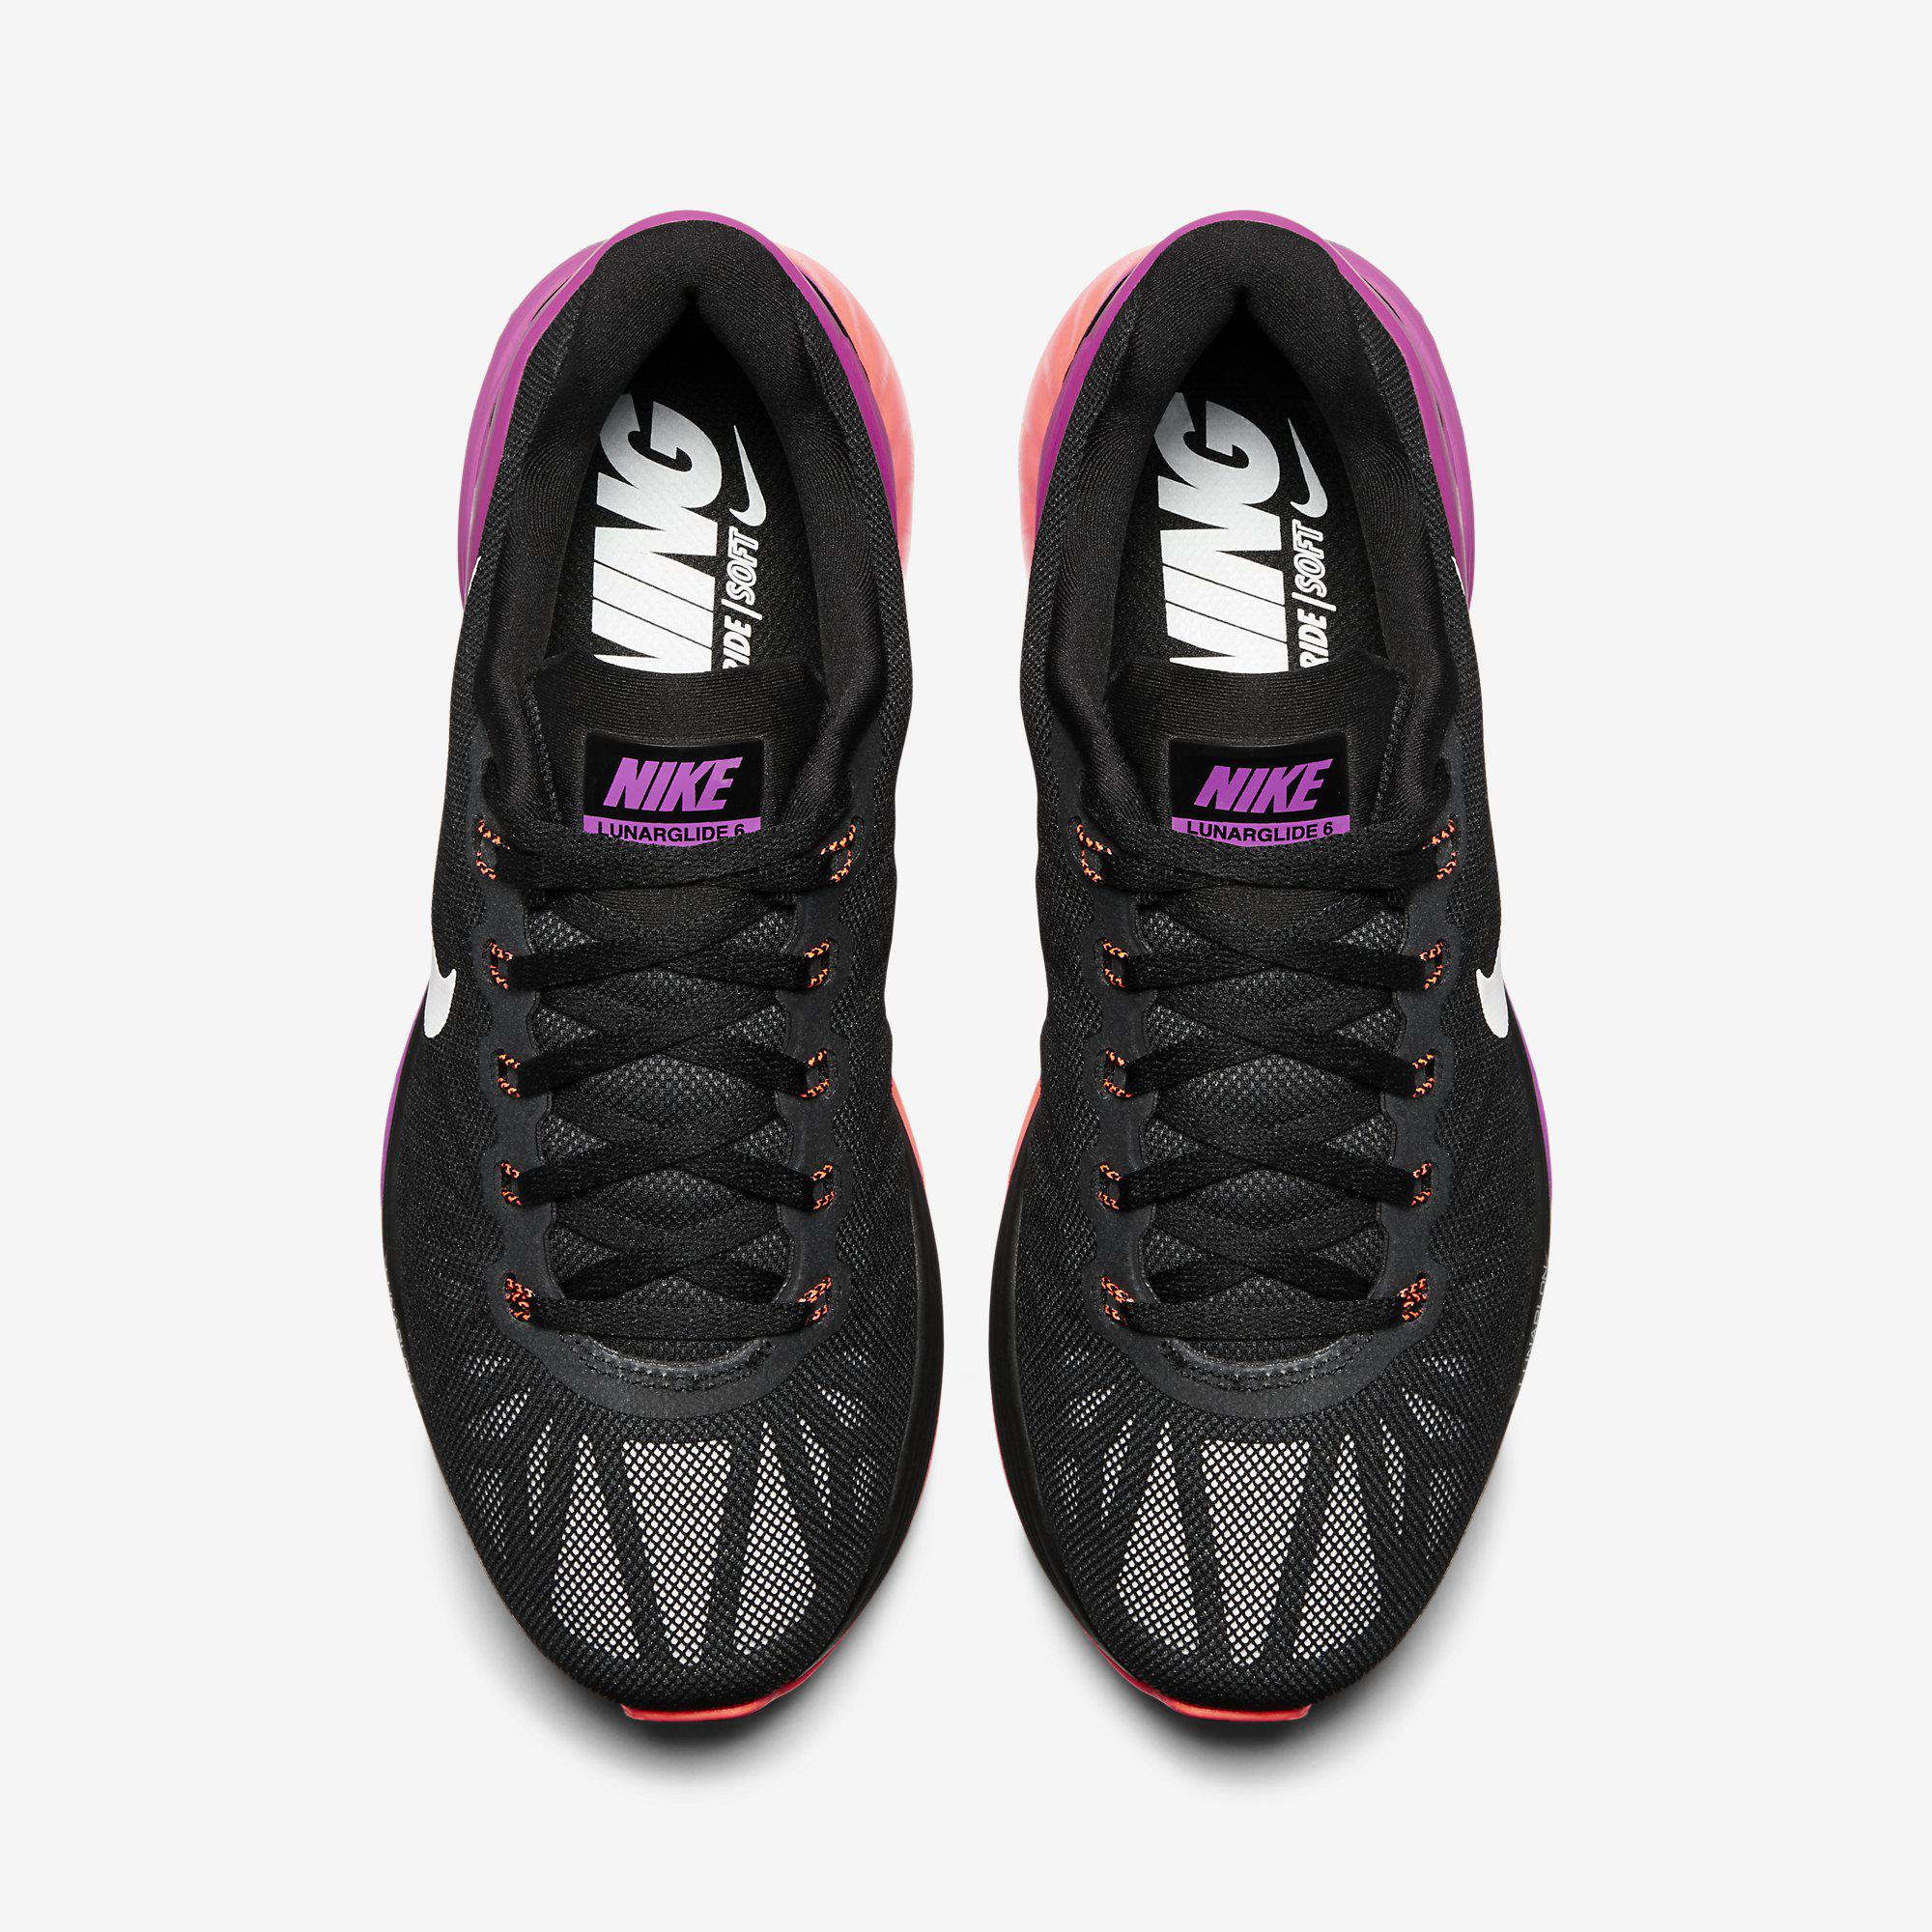 new arrival e81e4 e72ec Nike Womens LunarGlide 6 Running Shoes - Black/Fuchsia Flash